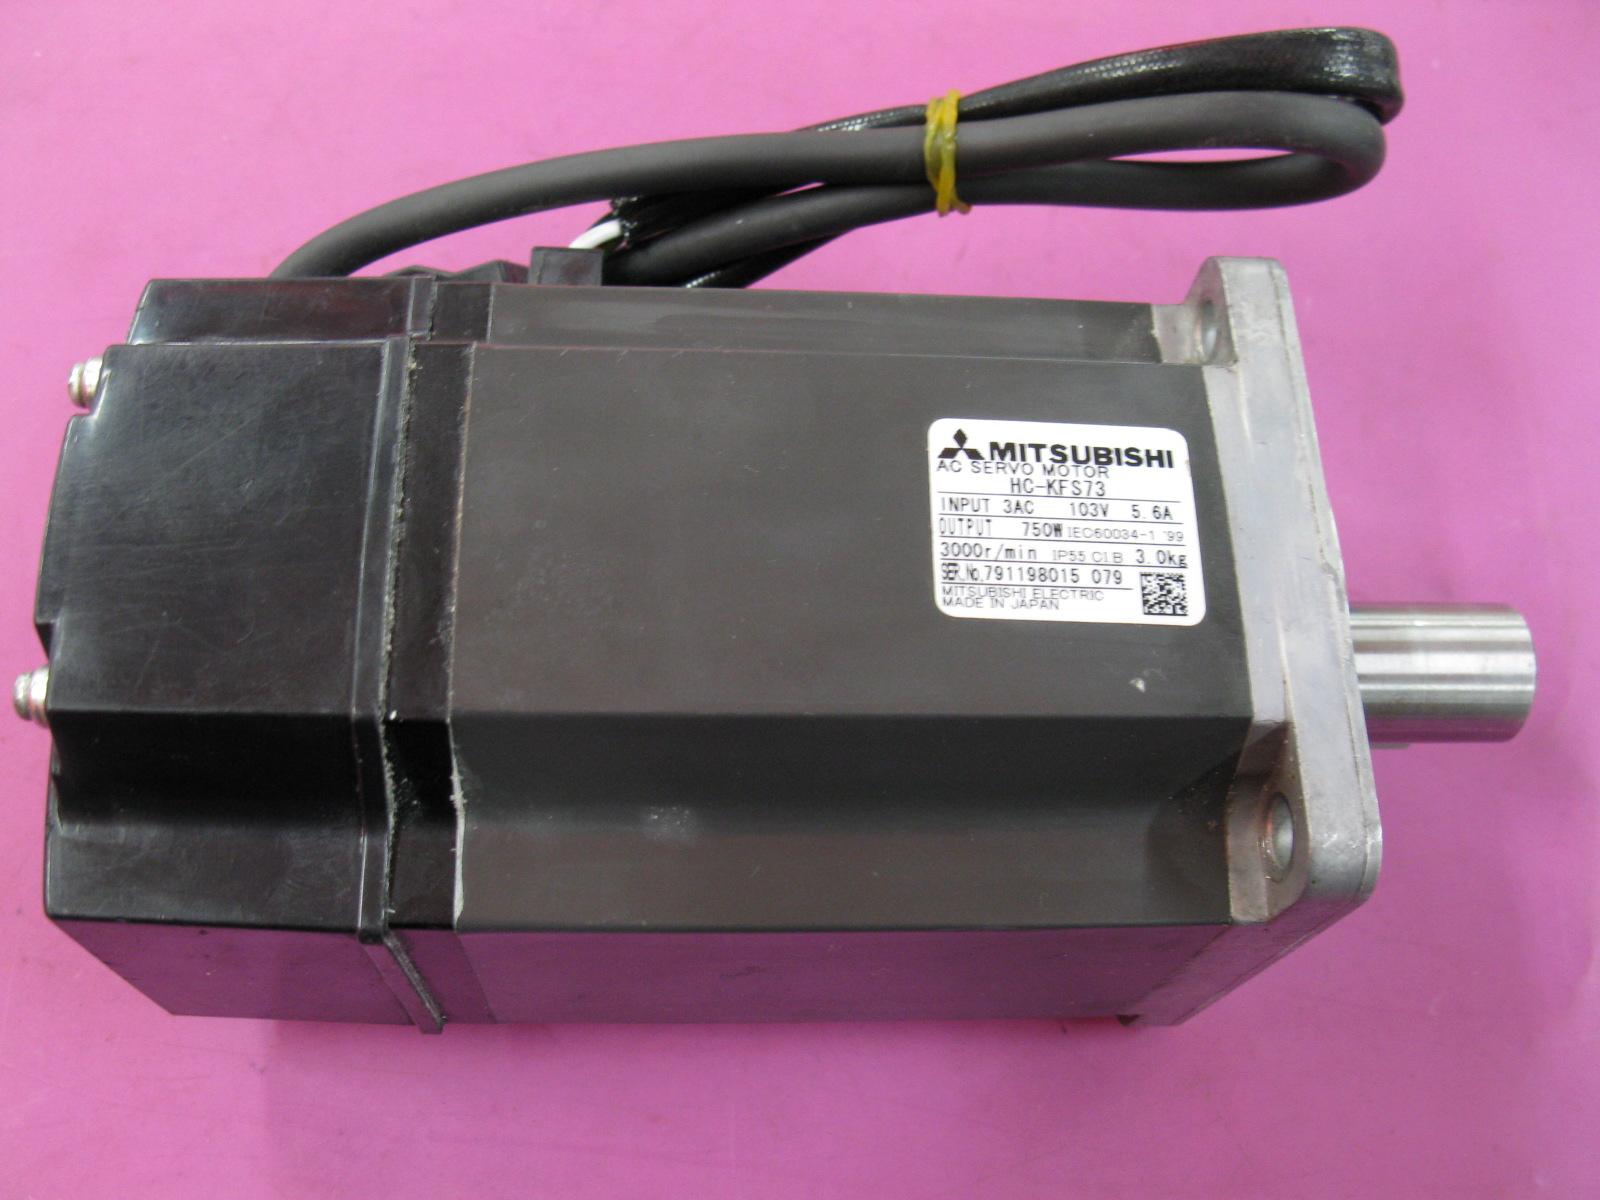 Servo motor HC-KFS73